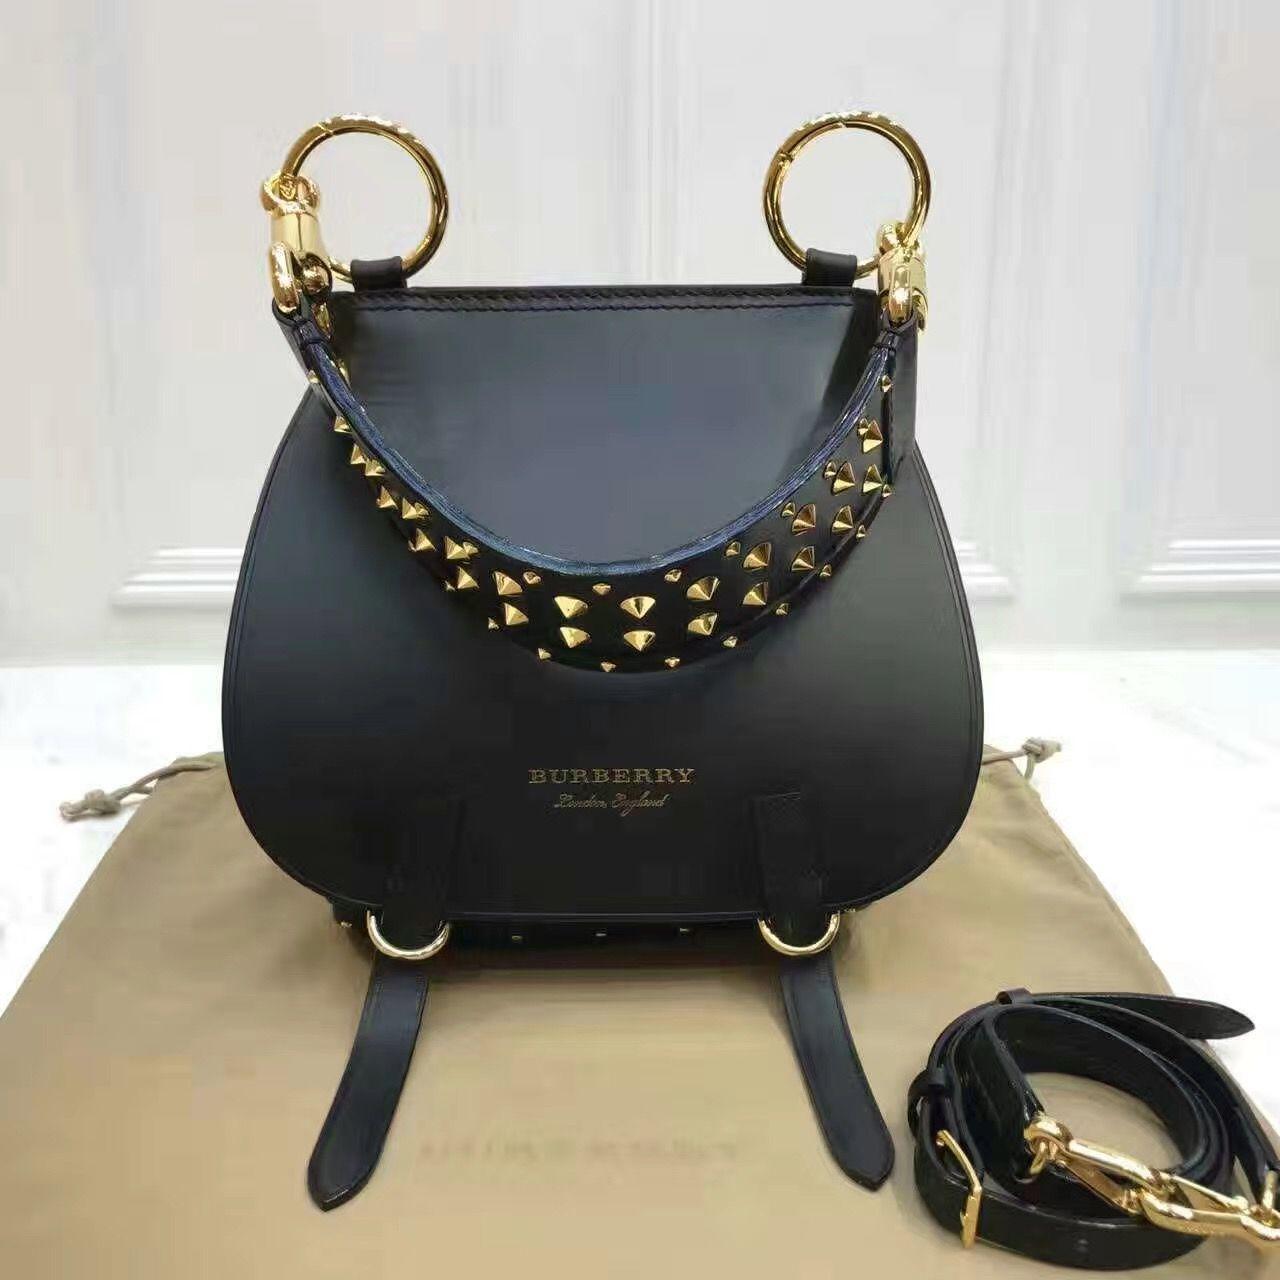 Authentic Quality 1 1 Mirror Replica Burberry Bridle Bag Black 40459761 b1dfd4557d7a0